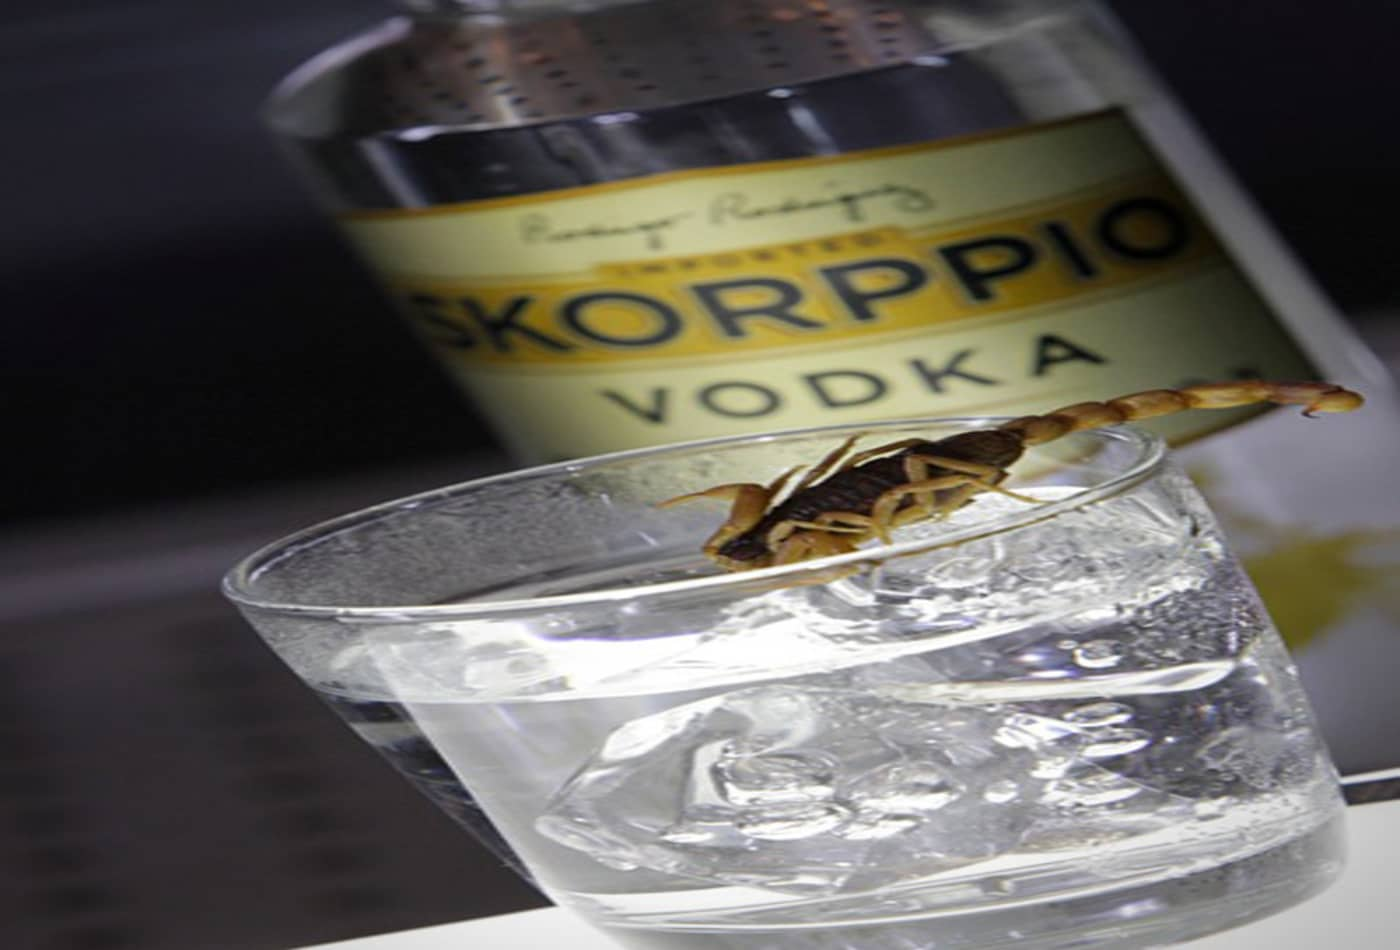 outrageous-drinks-skorppio-vodka.jpg